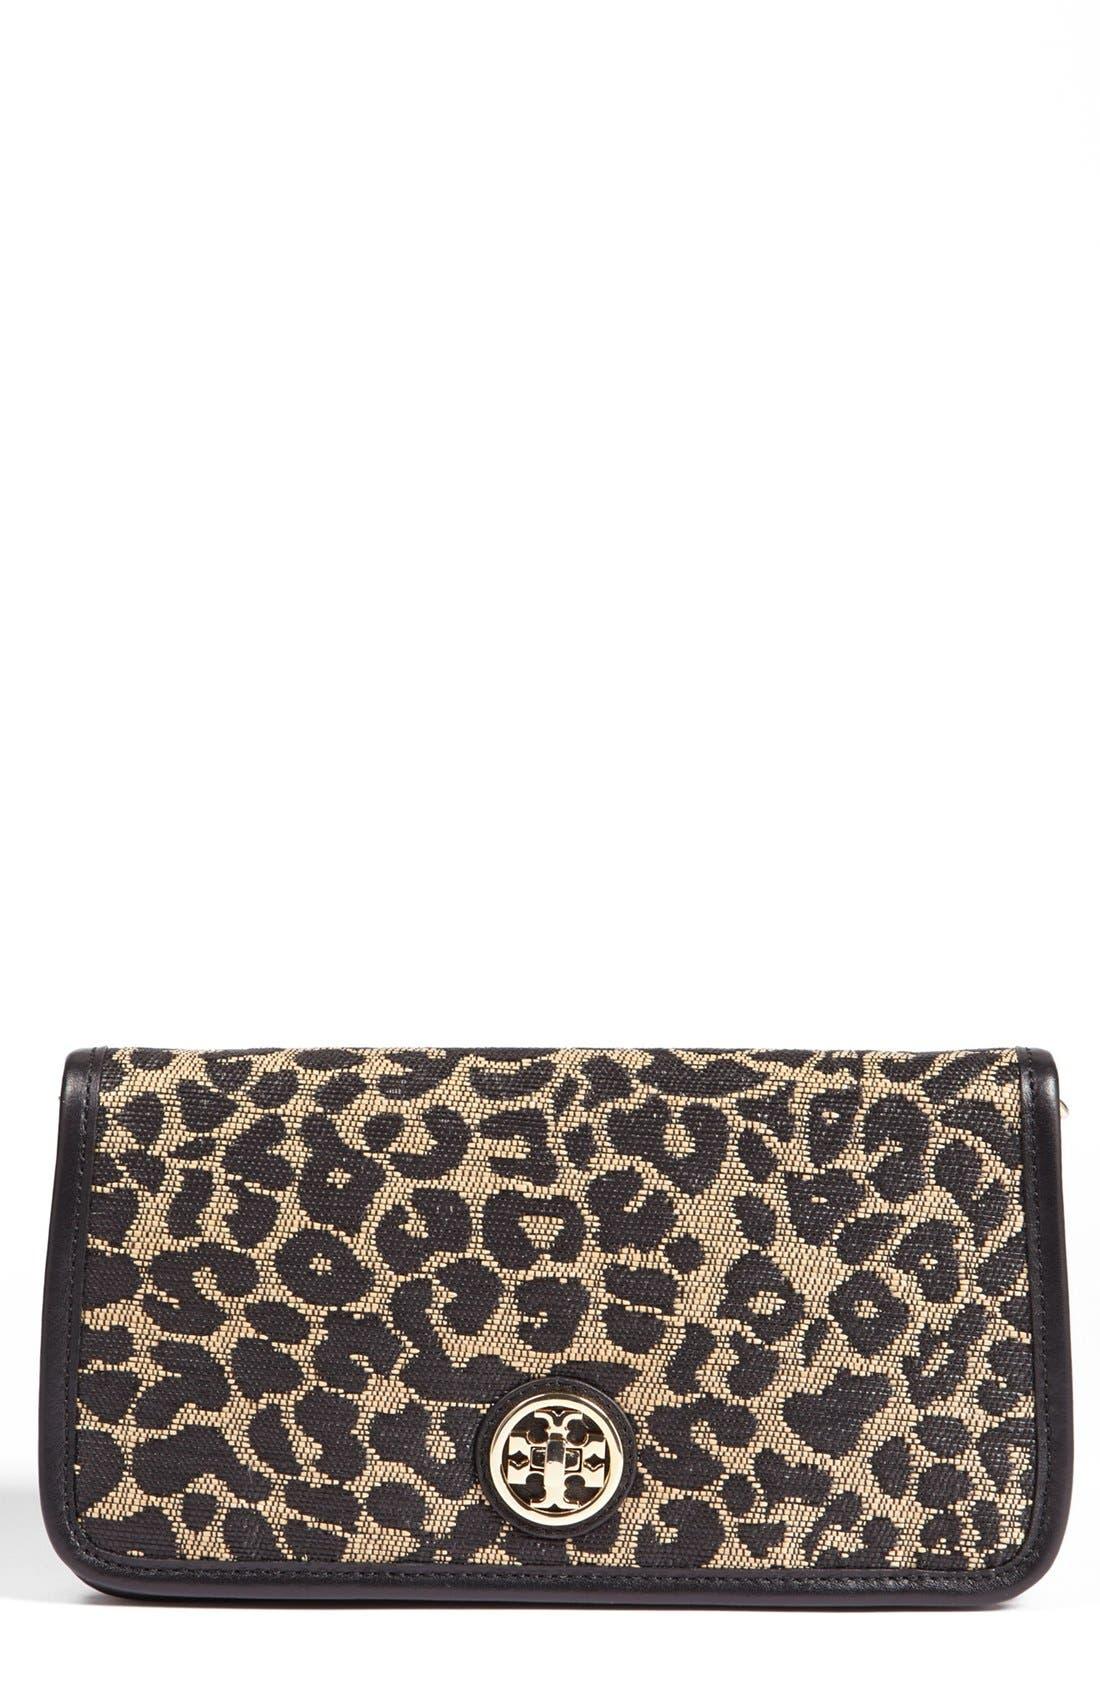 'Adalyn' Leopard Raffia Clutch, Main, color, 001